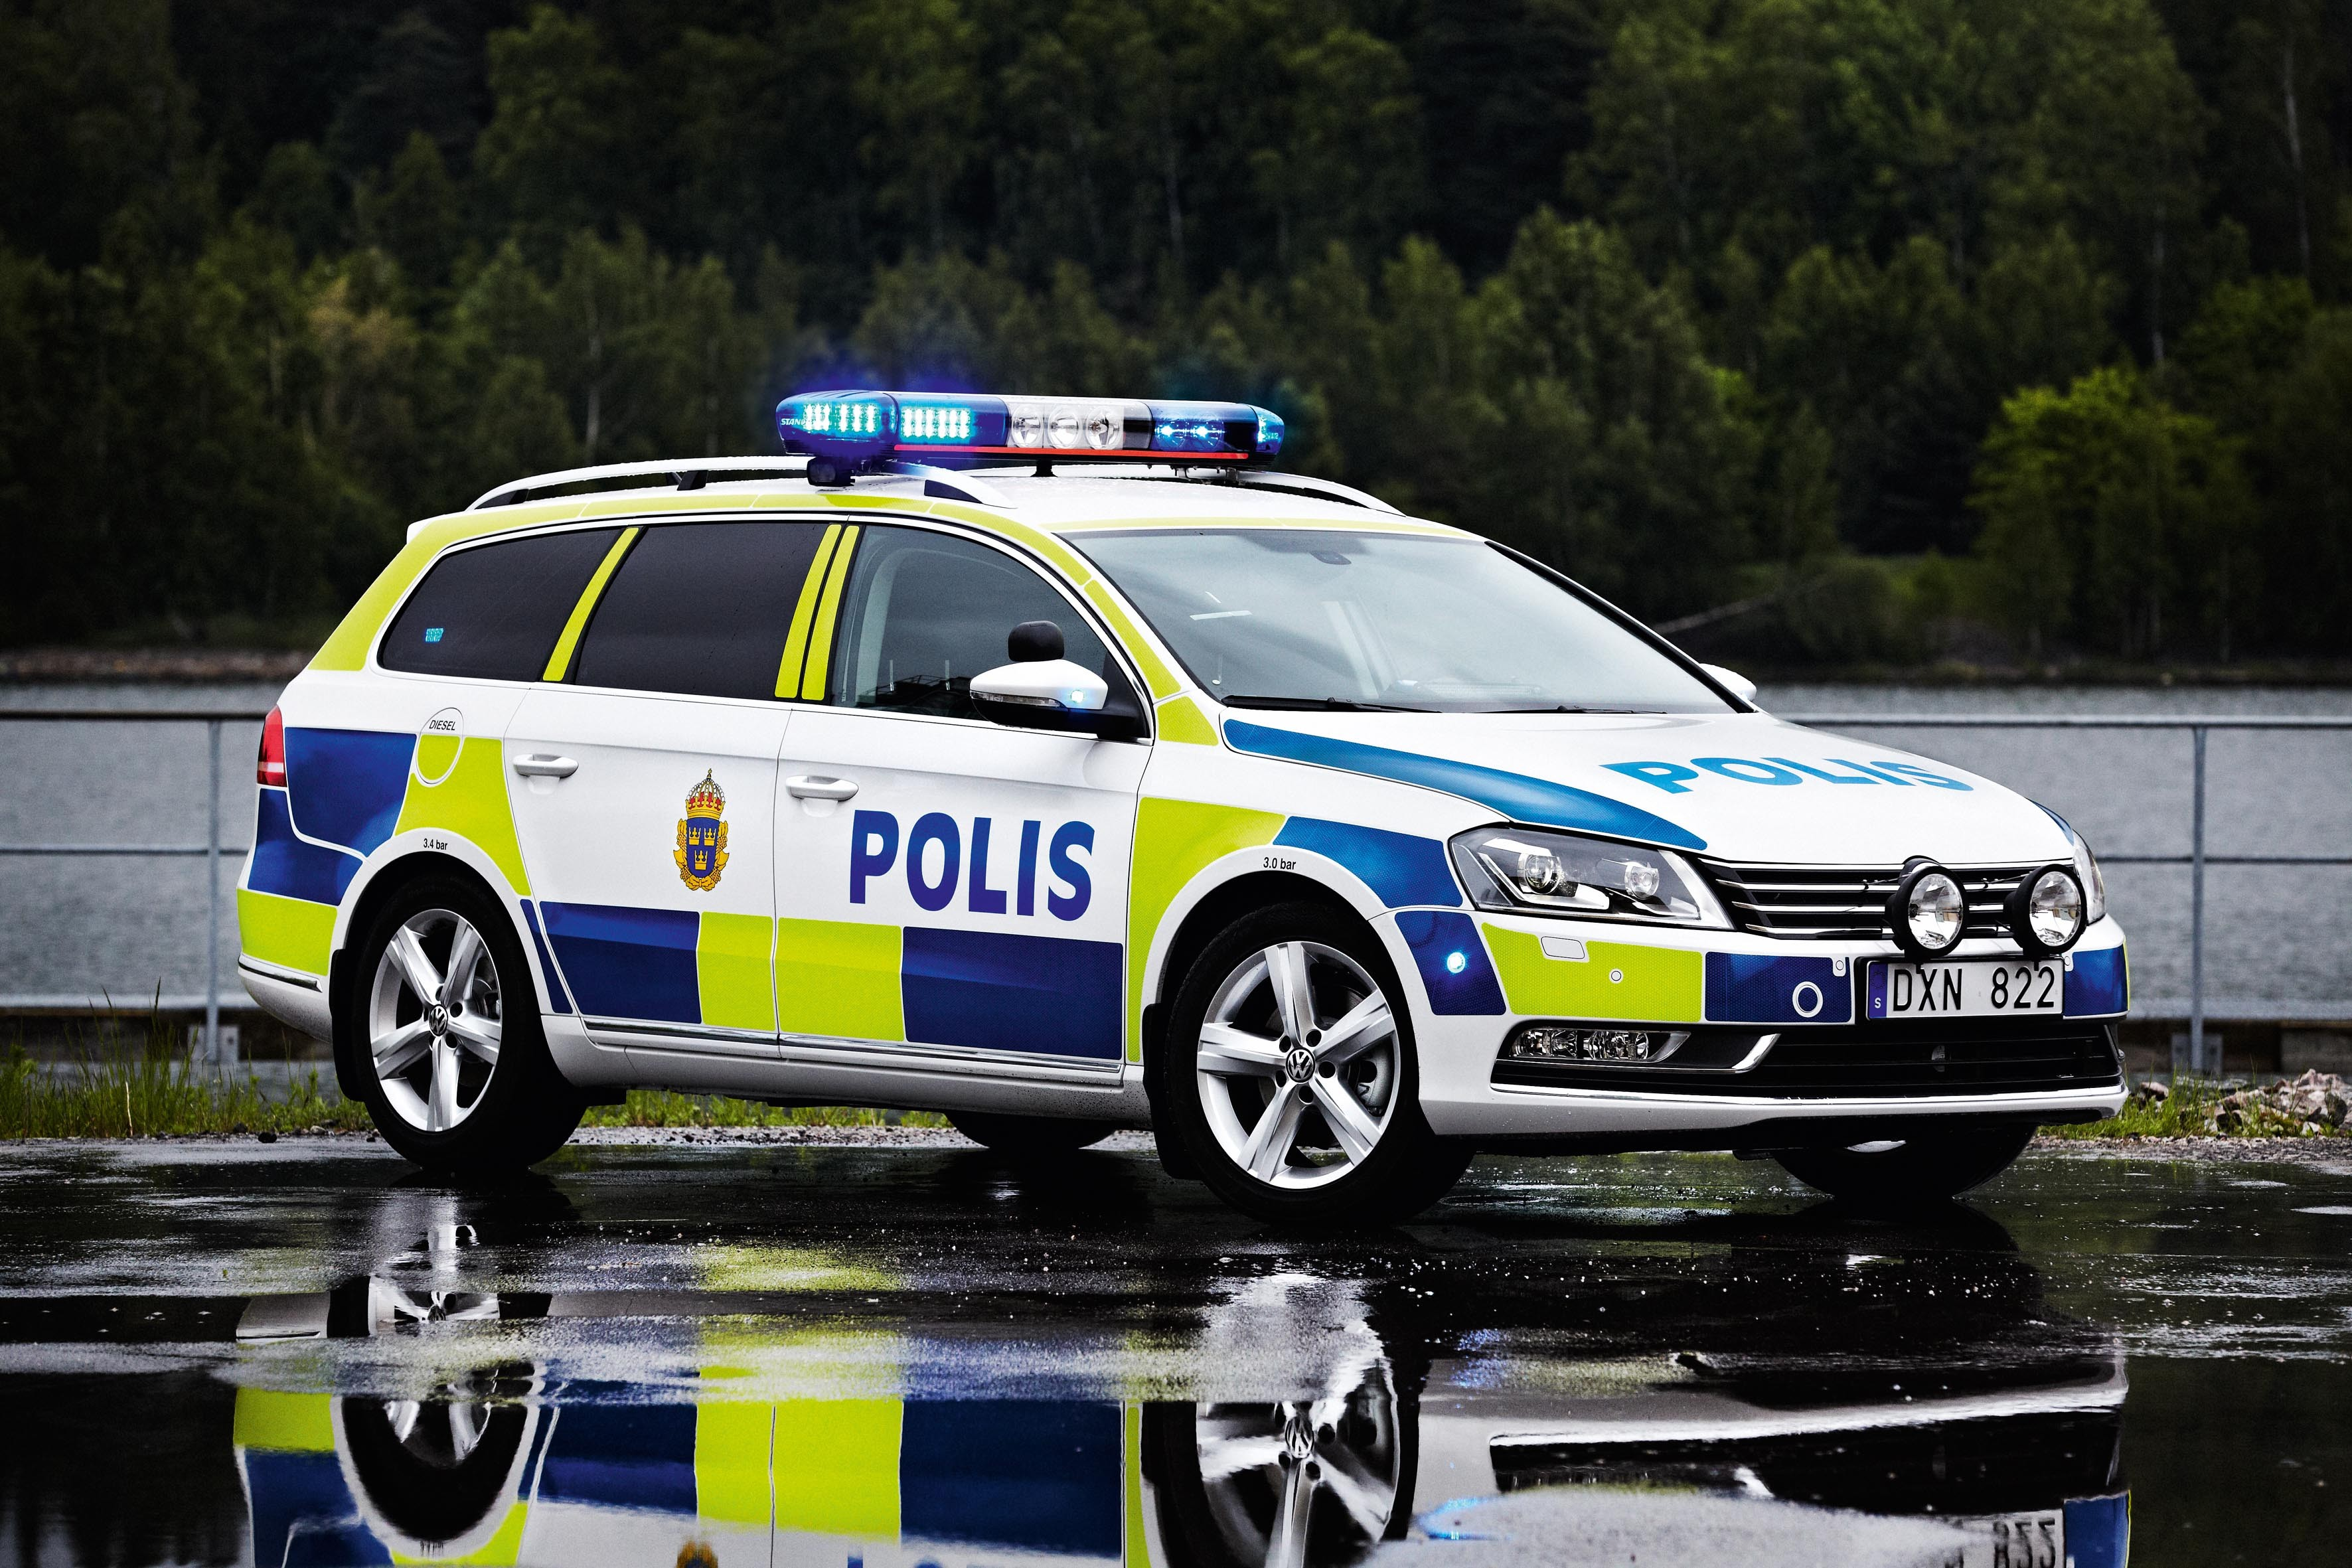 VW_Passat_Swedish_Police_Car_001.jpg